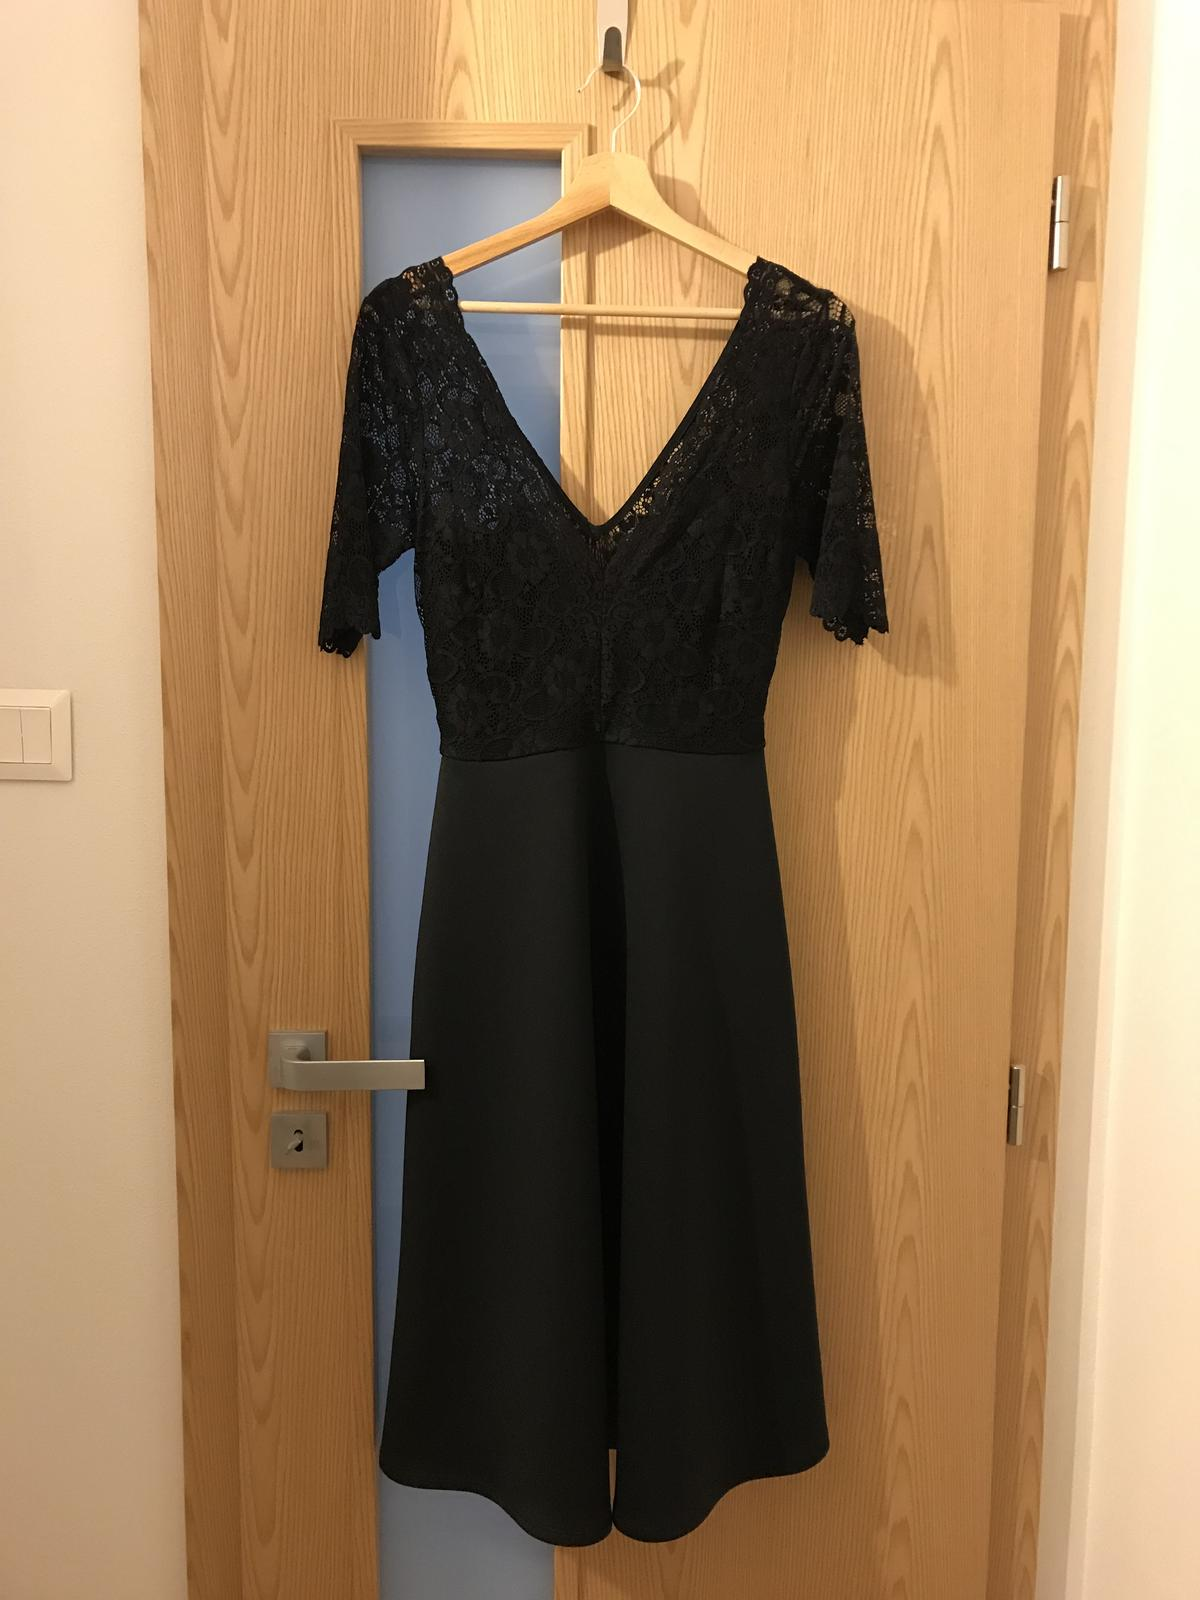 Šaty Elise Ryan - Obrázok č. 4